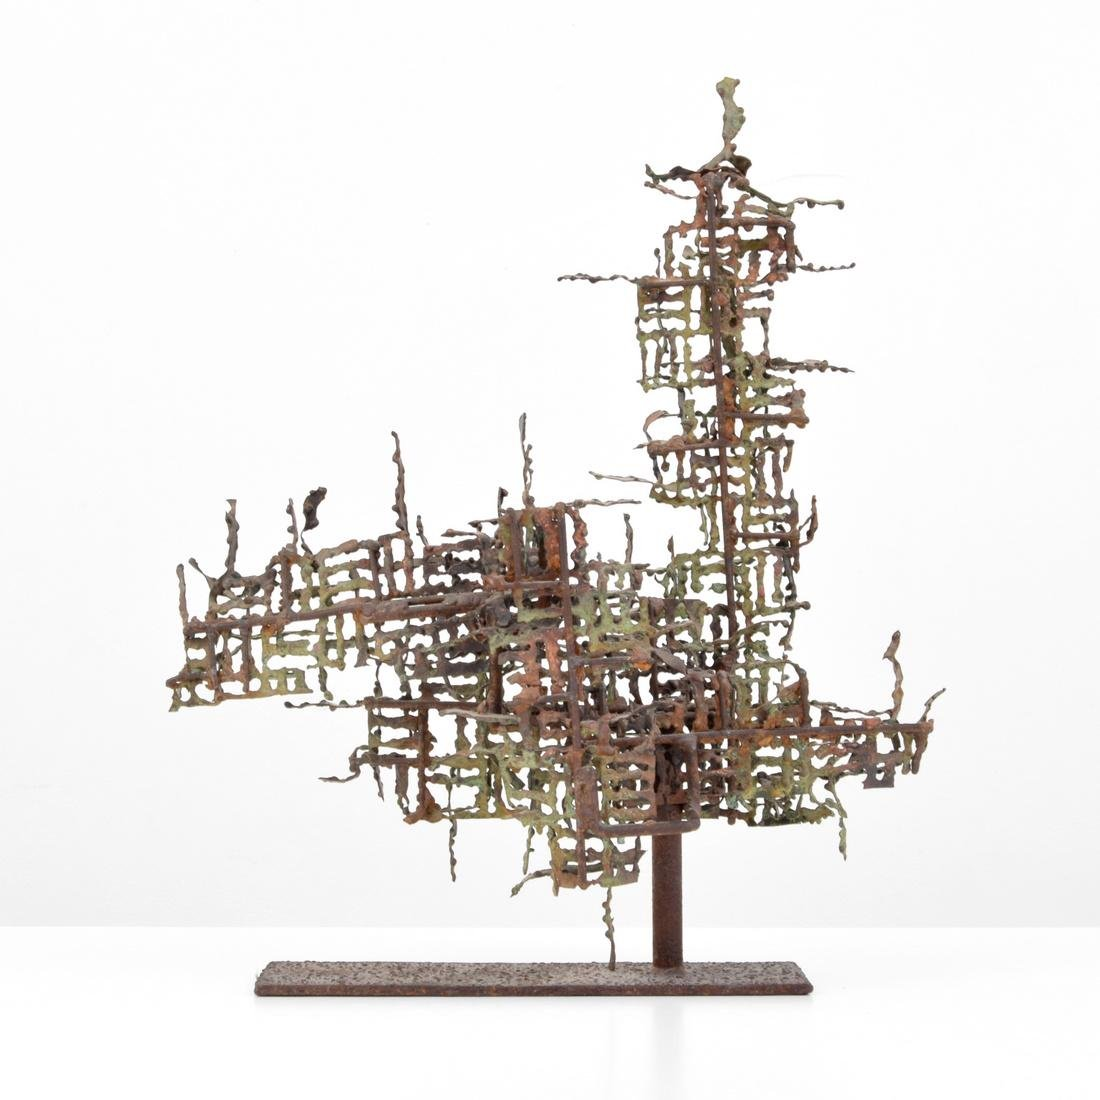 Marcello Fantoni Brutalist Abstract Sculpture